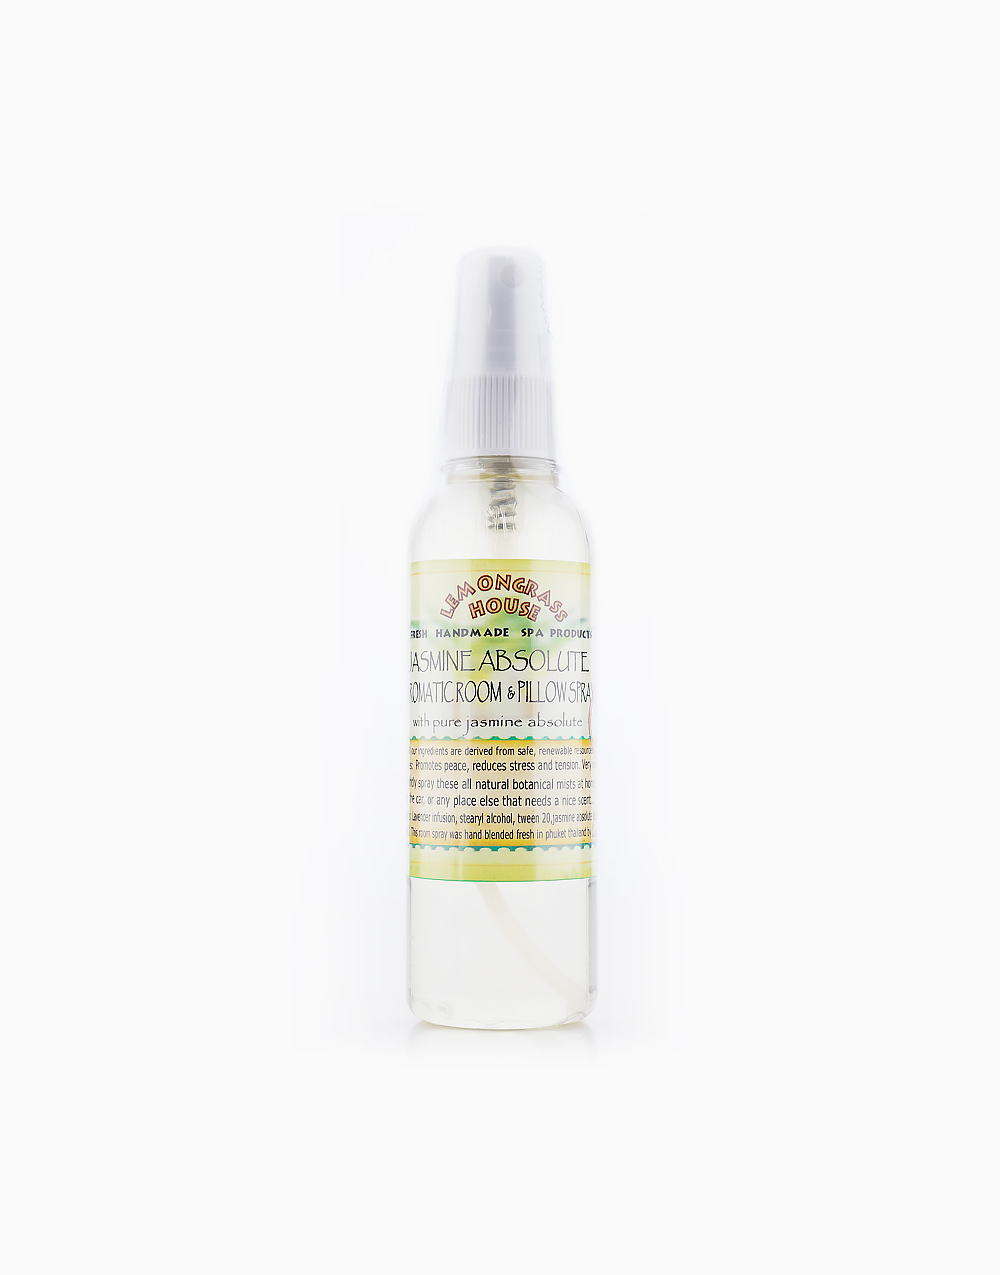 Jasmine Aromatic Room & Pillow Spray (120ml) by Lemongrass House